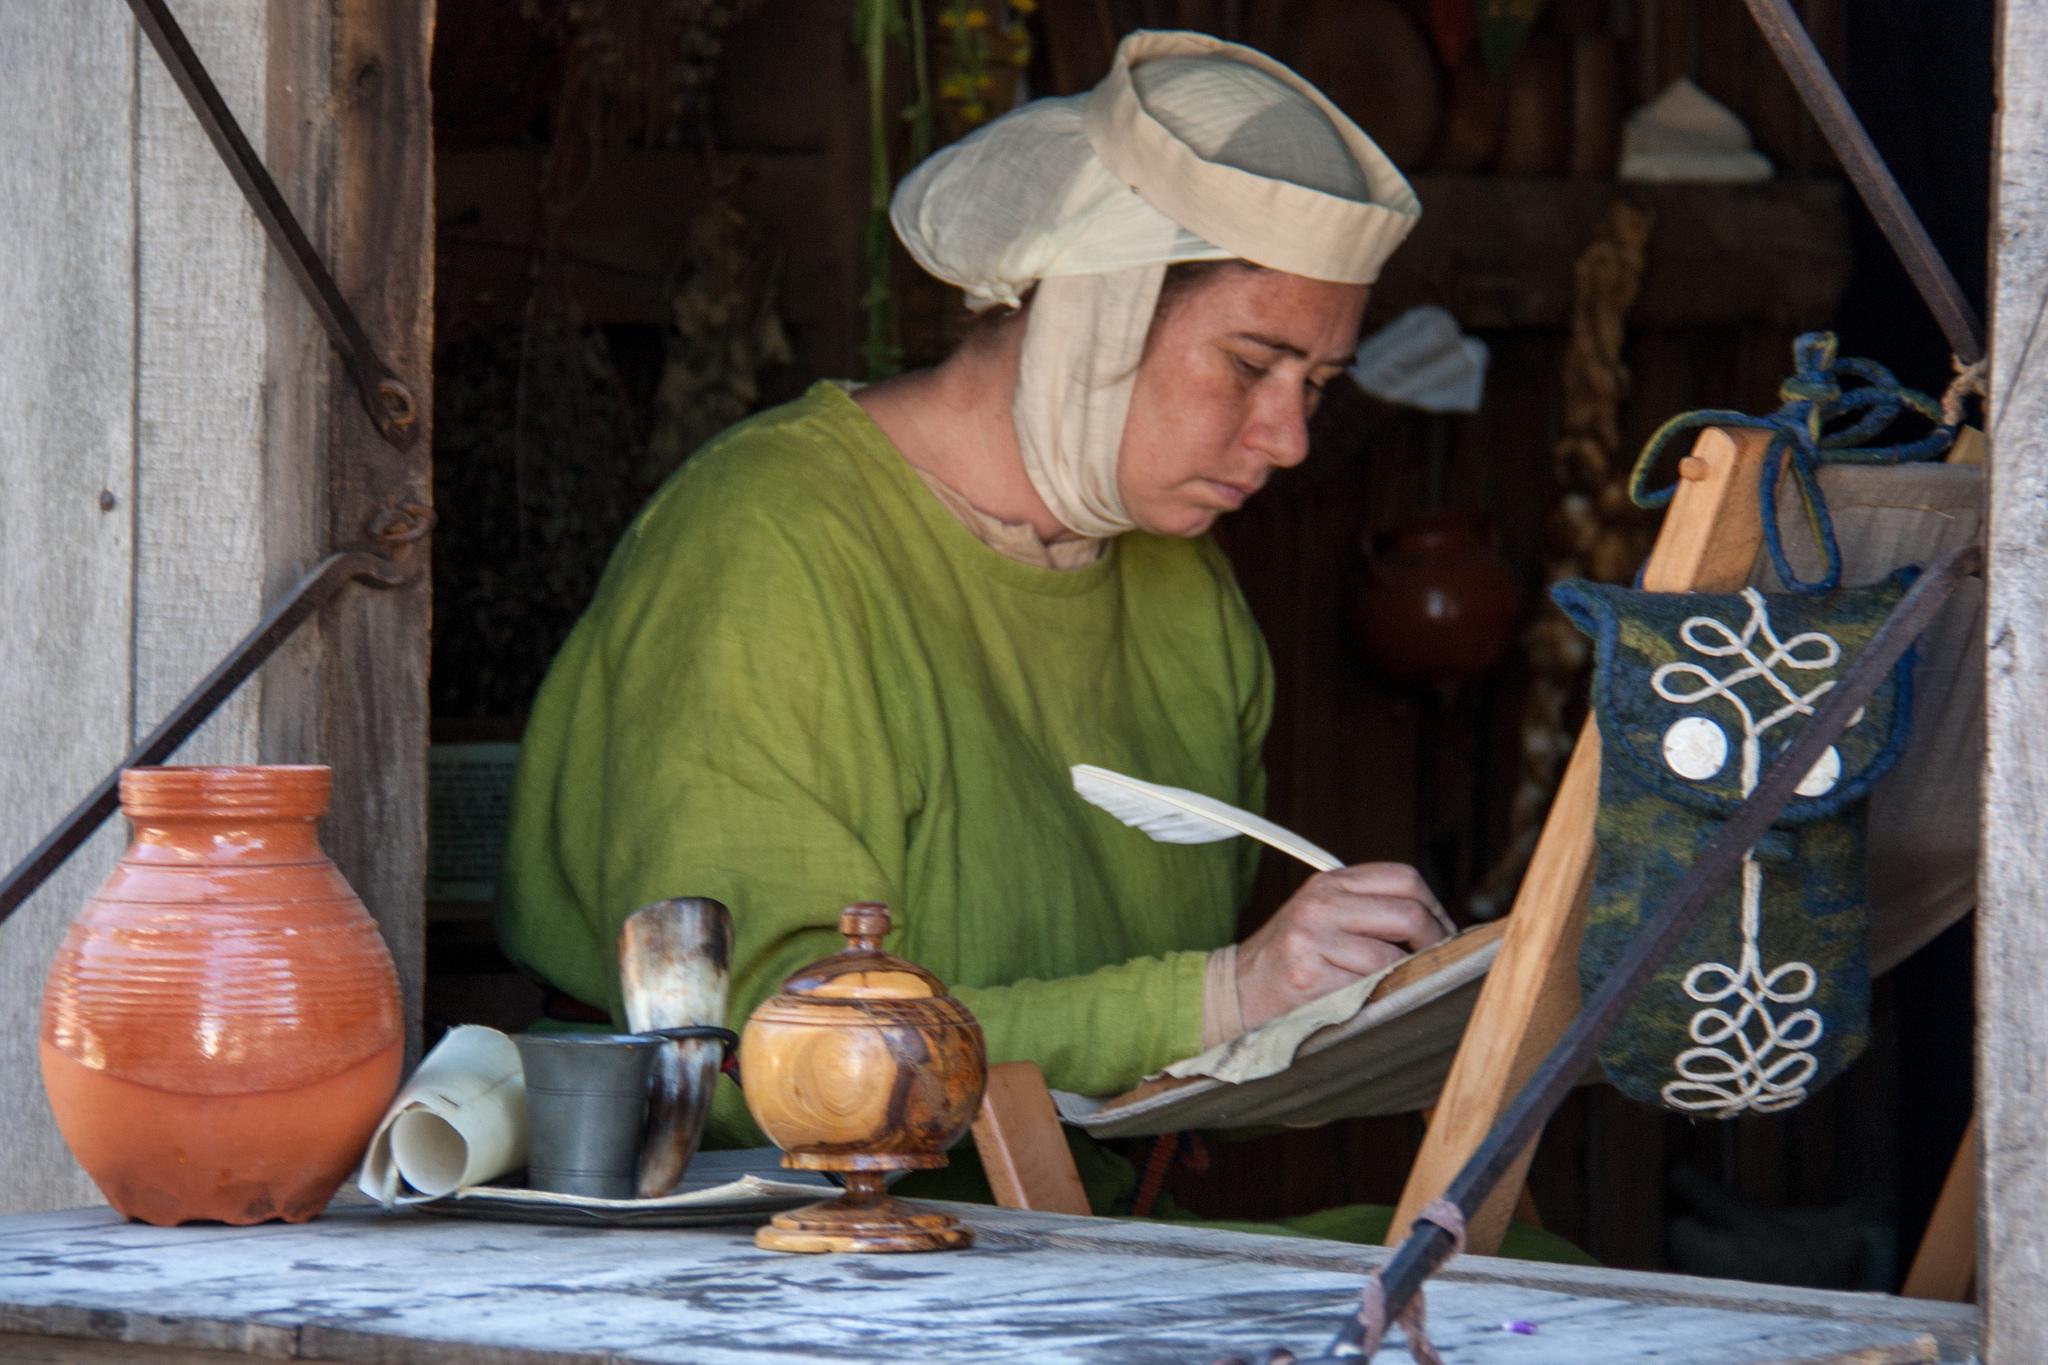 Medieval Writer by Hans Splinter